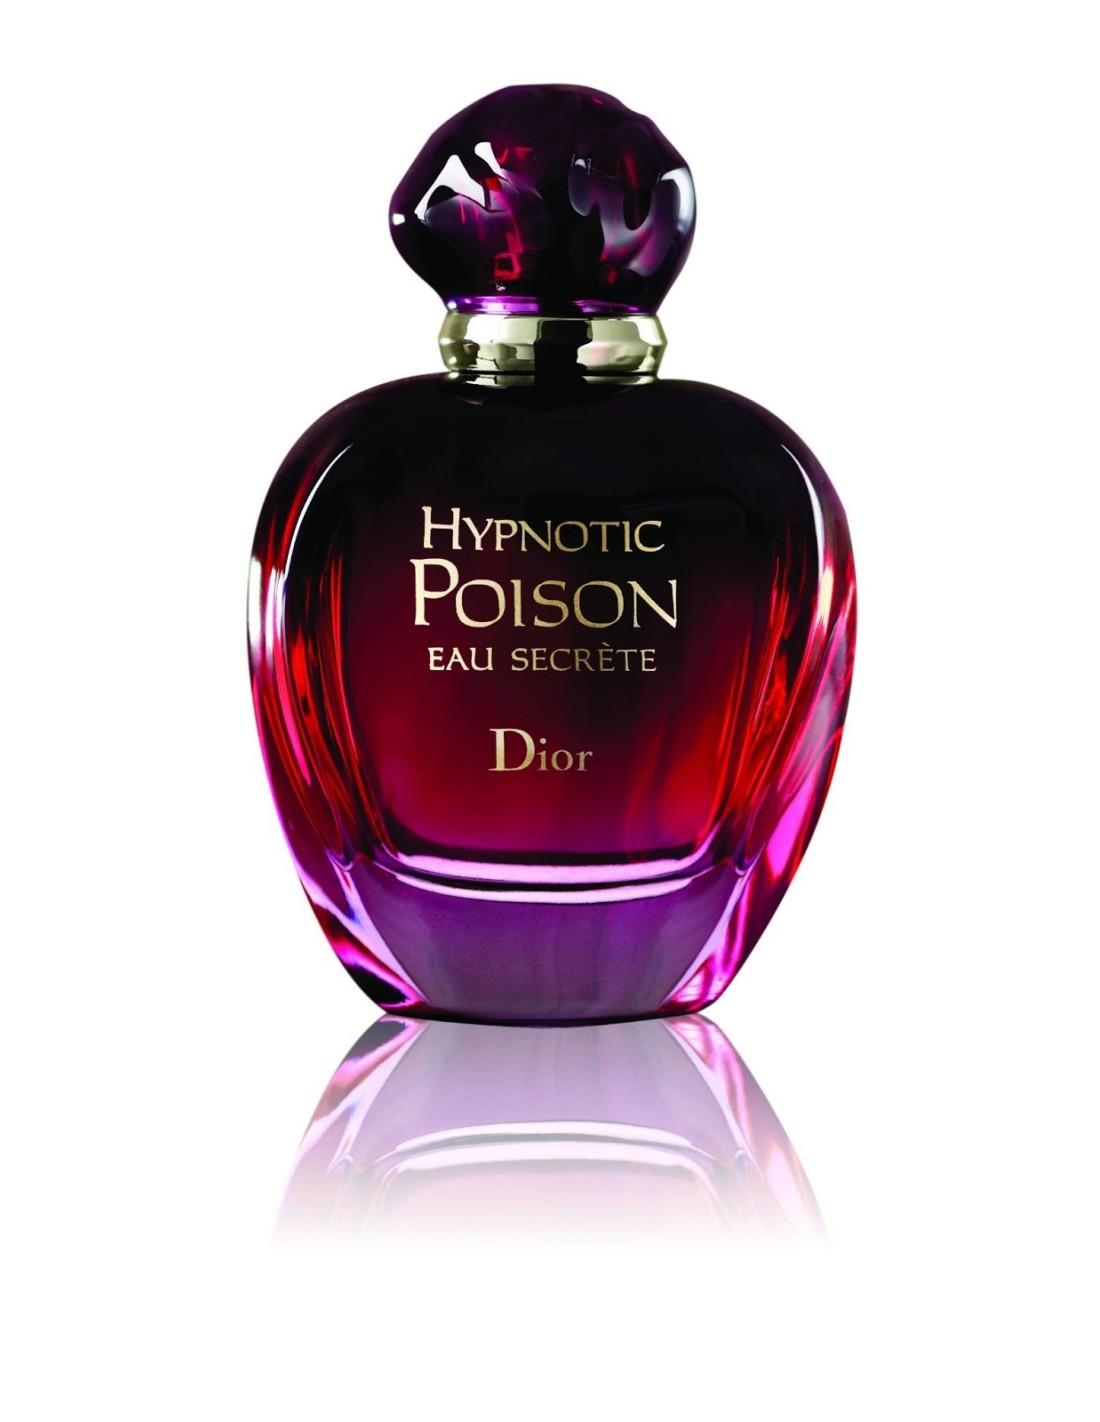 b7008cf14 عطر زنانه Dior Hypnotic Poison Eau Secrete دیور هیپنوتیک پویزن سیکرت